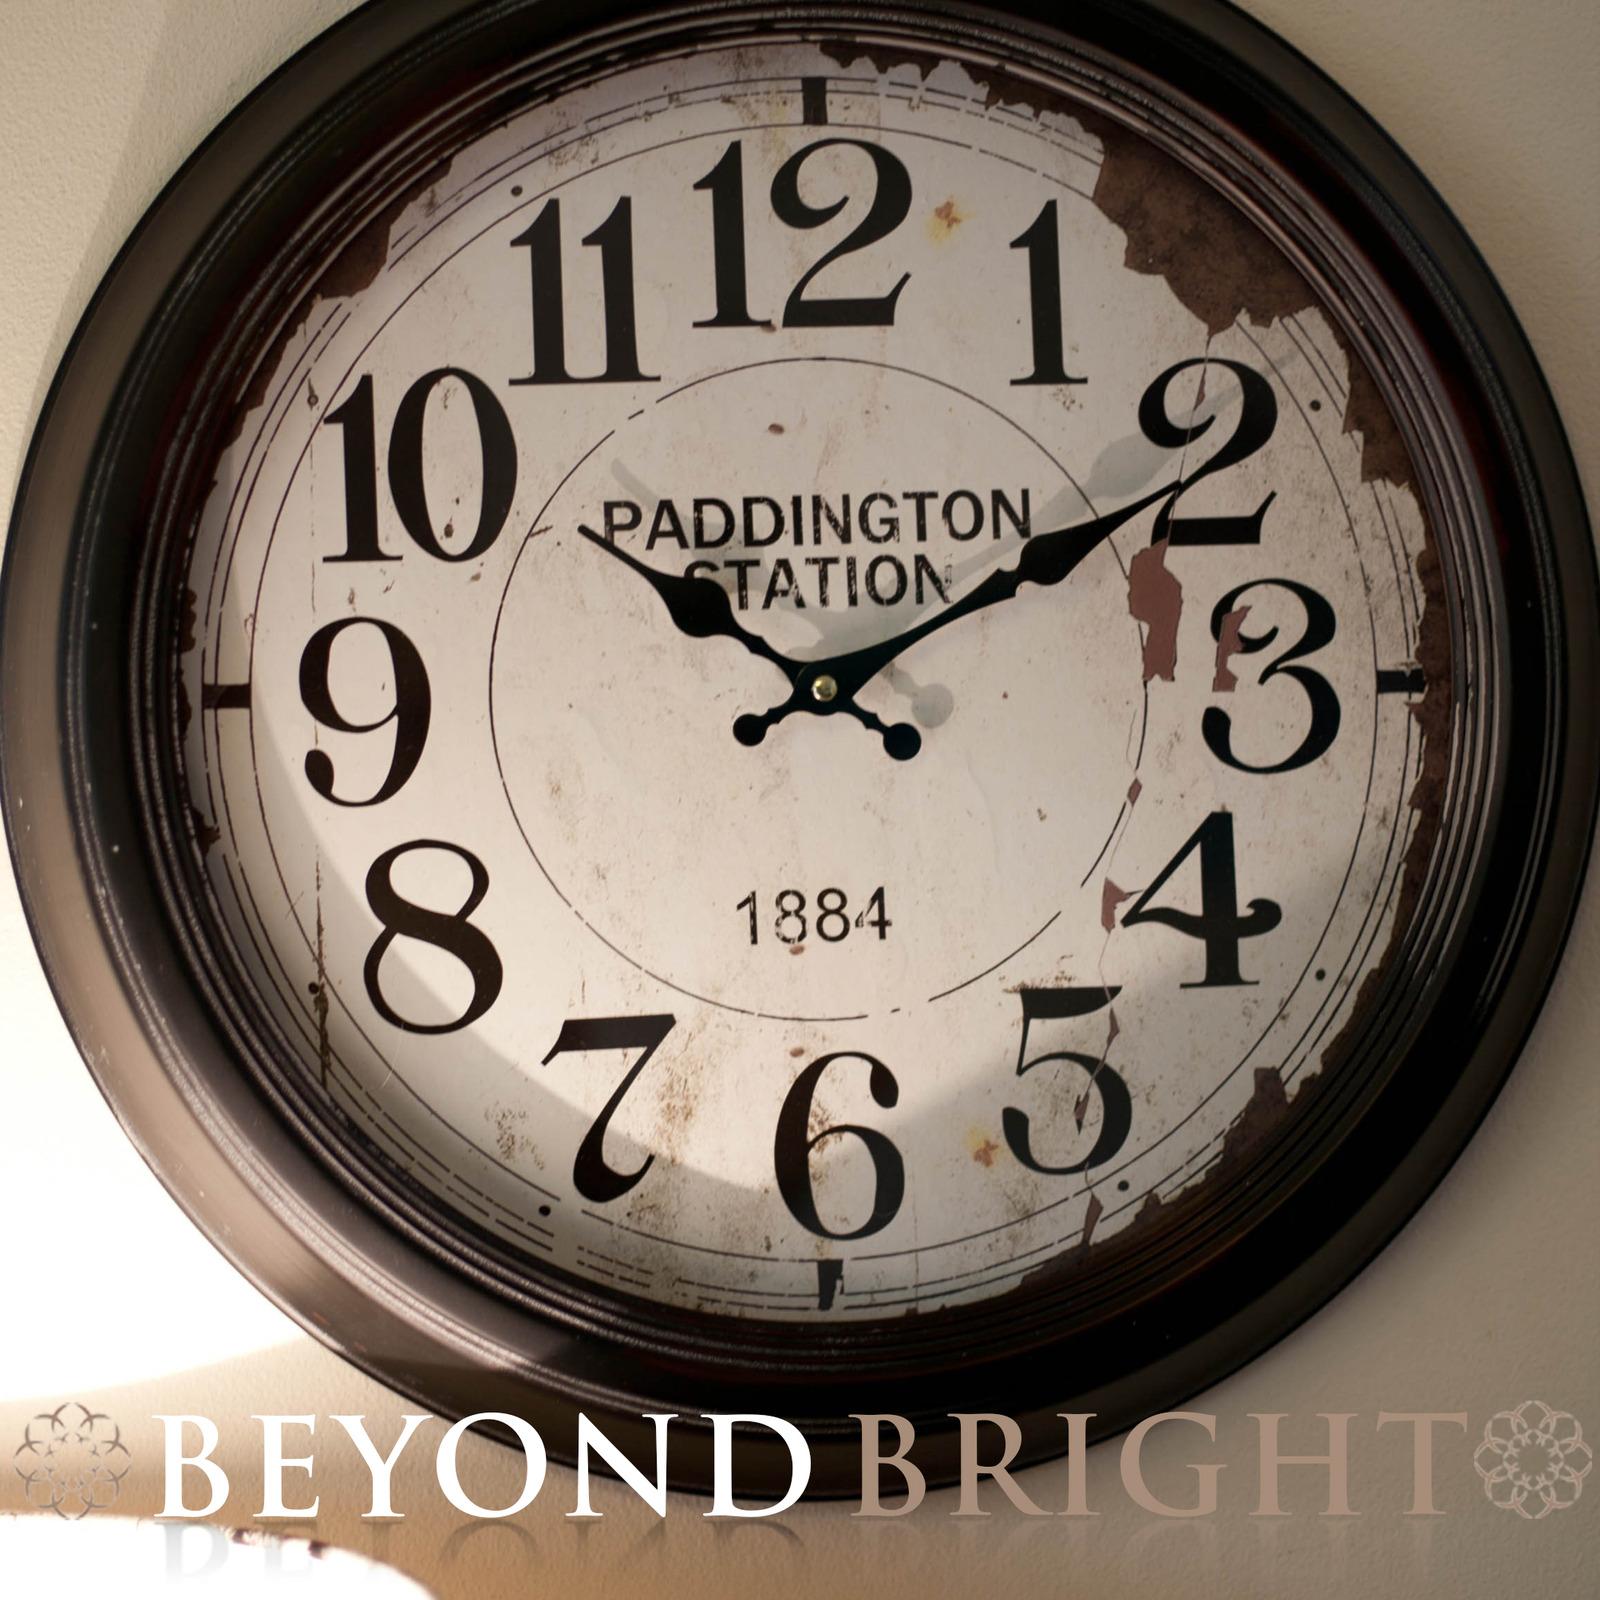 New Large Paddington Station Wall Clock Industrial Vintage